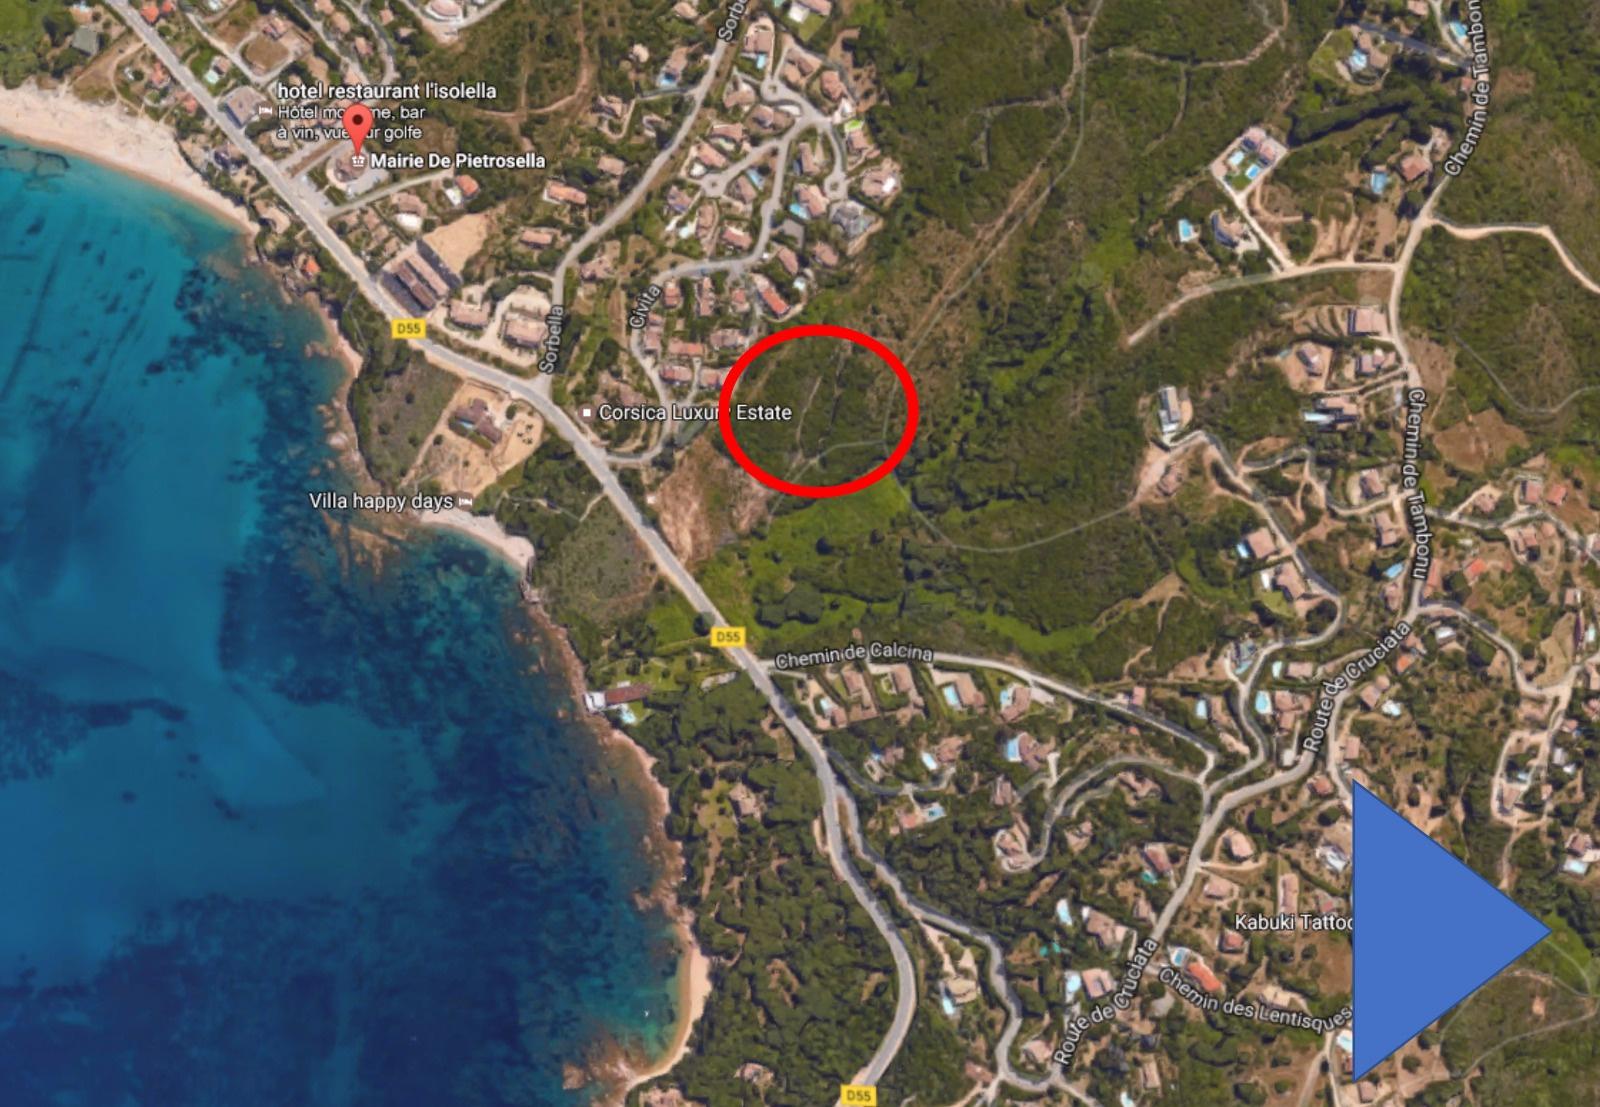 Les rivages de la Stagnola Programme neuf Porticcio - localisation